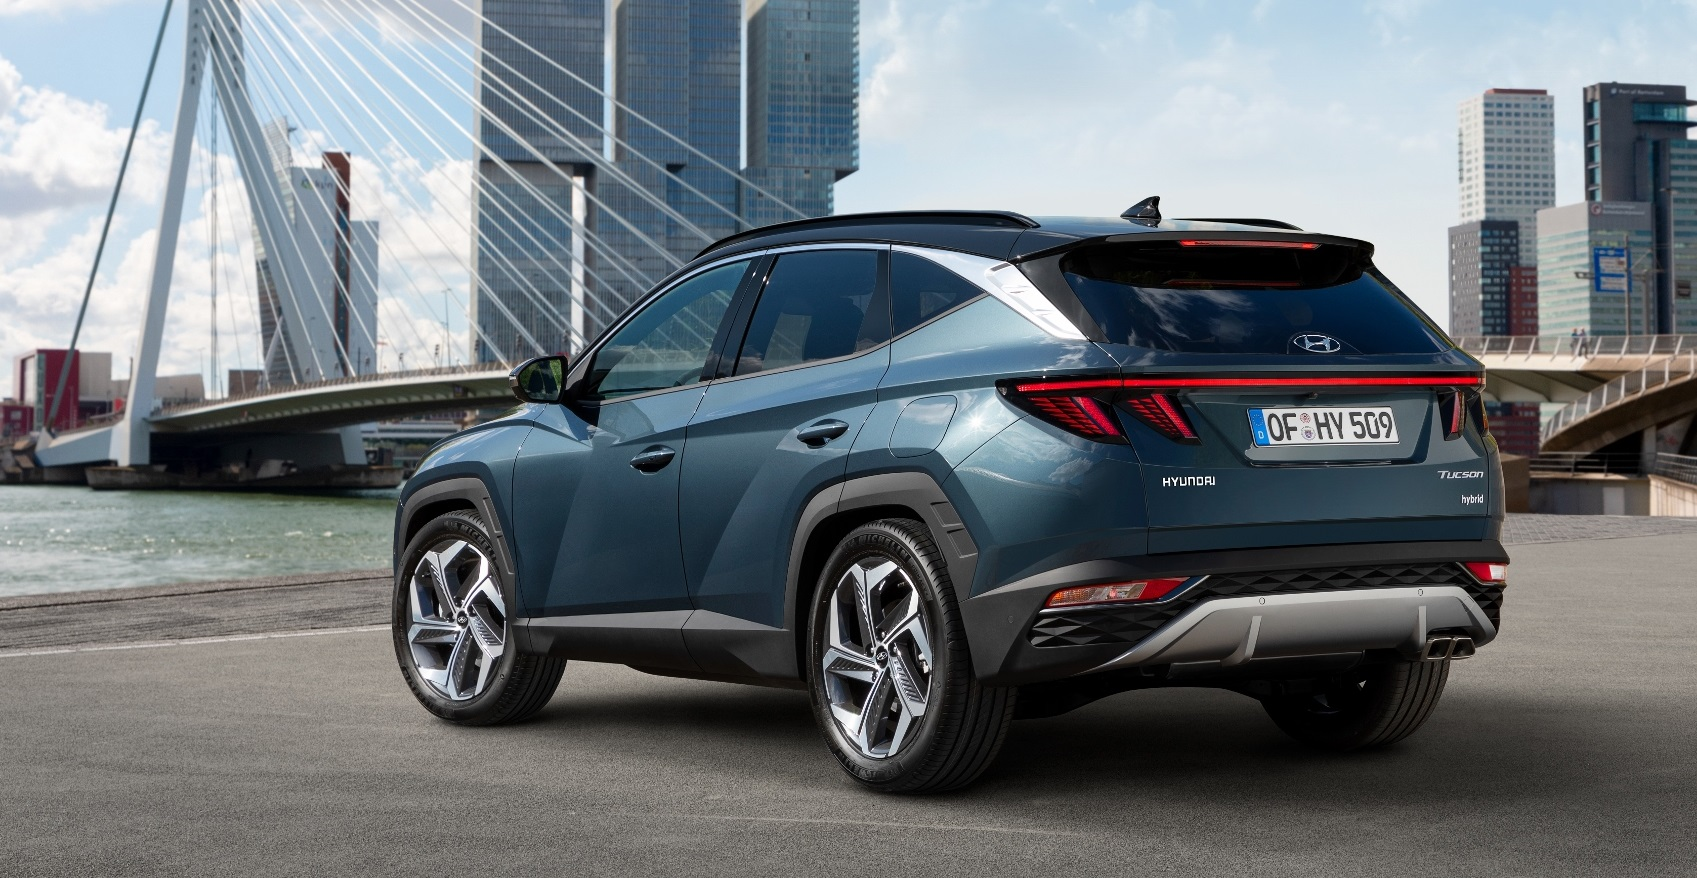 all-new Hyundai Tucson (2) (1700x1133)